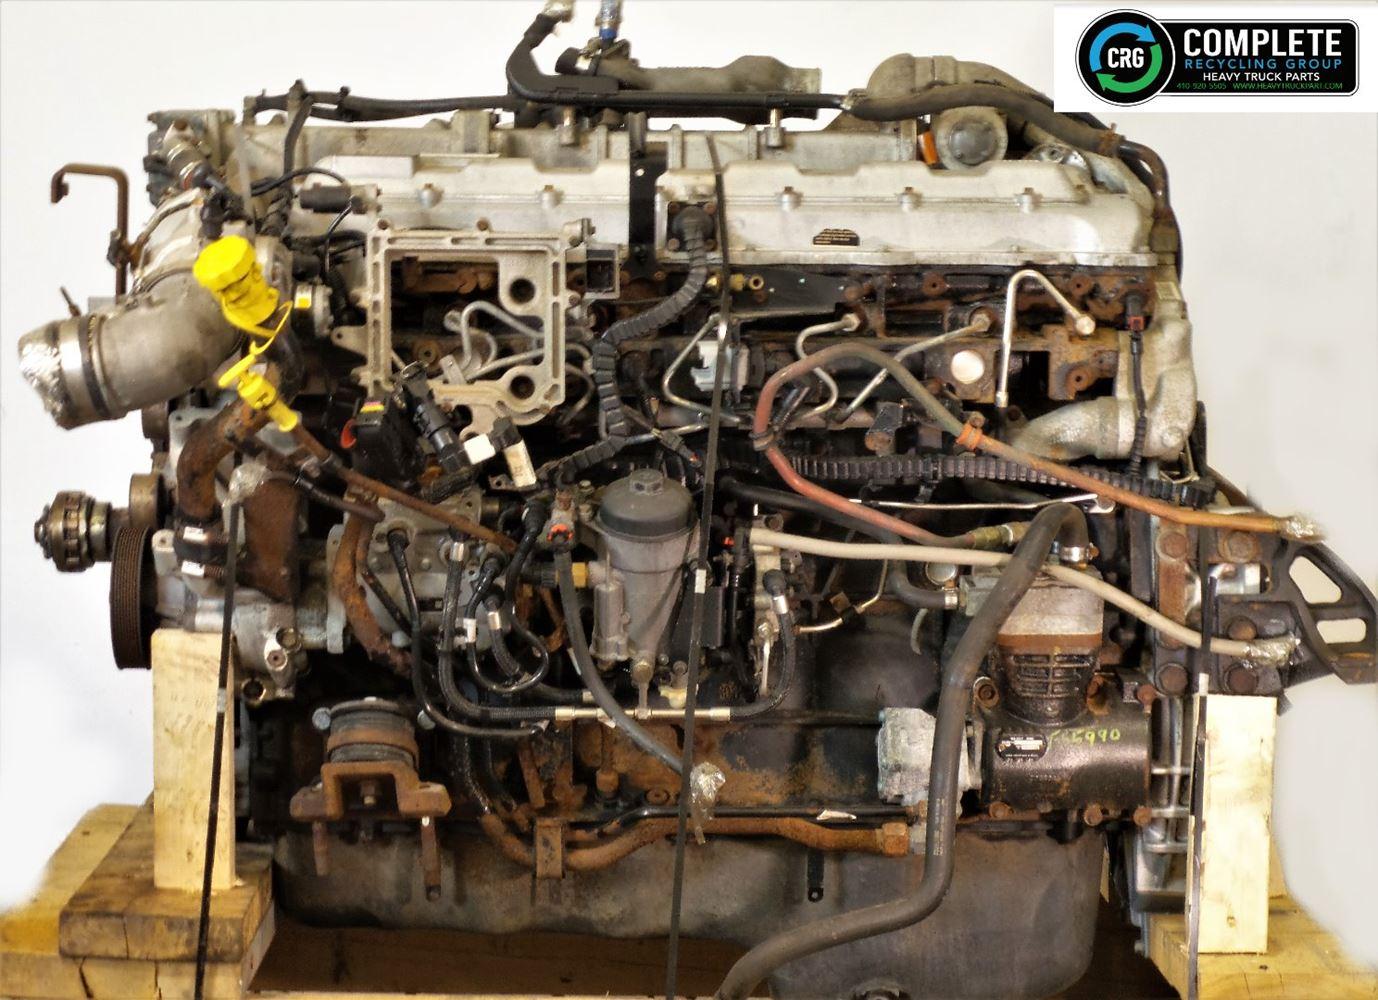 2013 INTERNATIONAL MAXXFORCE 13 ENGINE ASSEMBLY TRUCK PARTS #679818